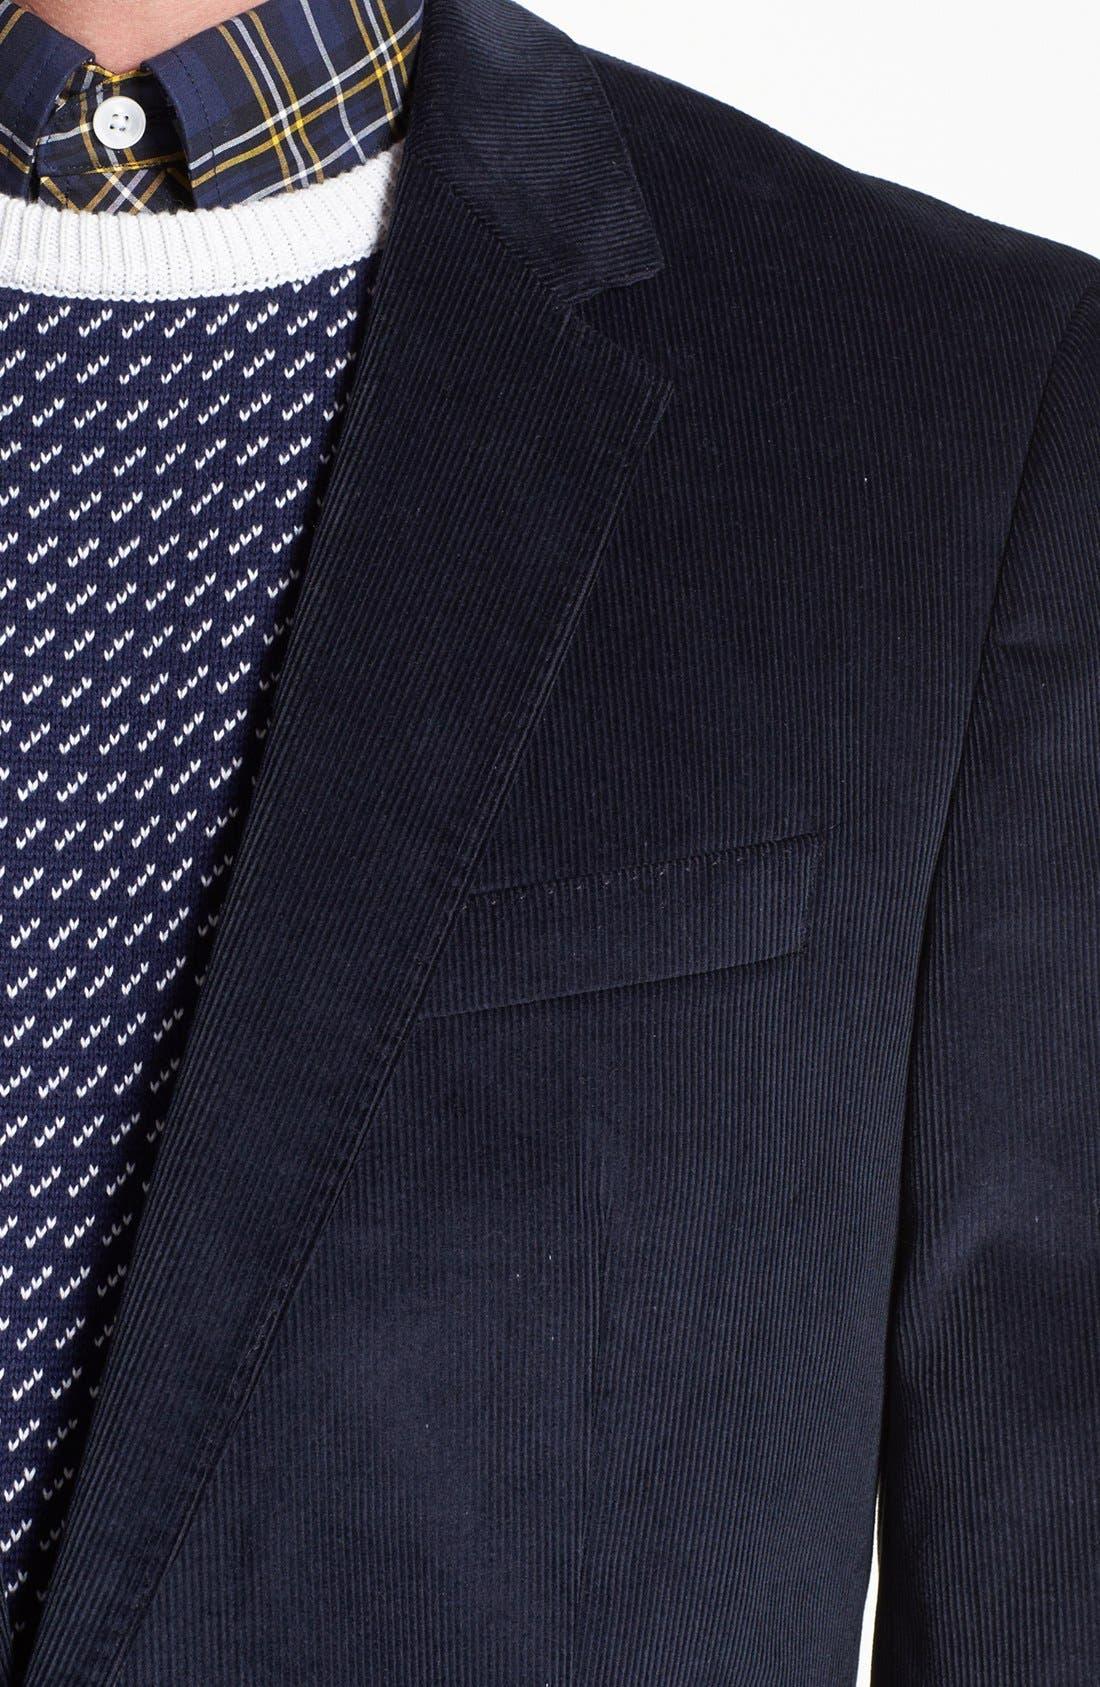 Alternate Image 2  - BOSS 'Hedge/Gense' Trim Fit Corduroy Suit